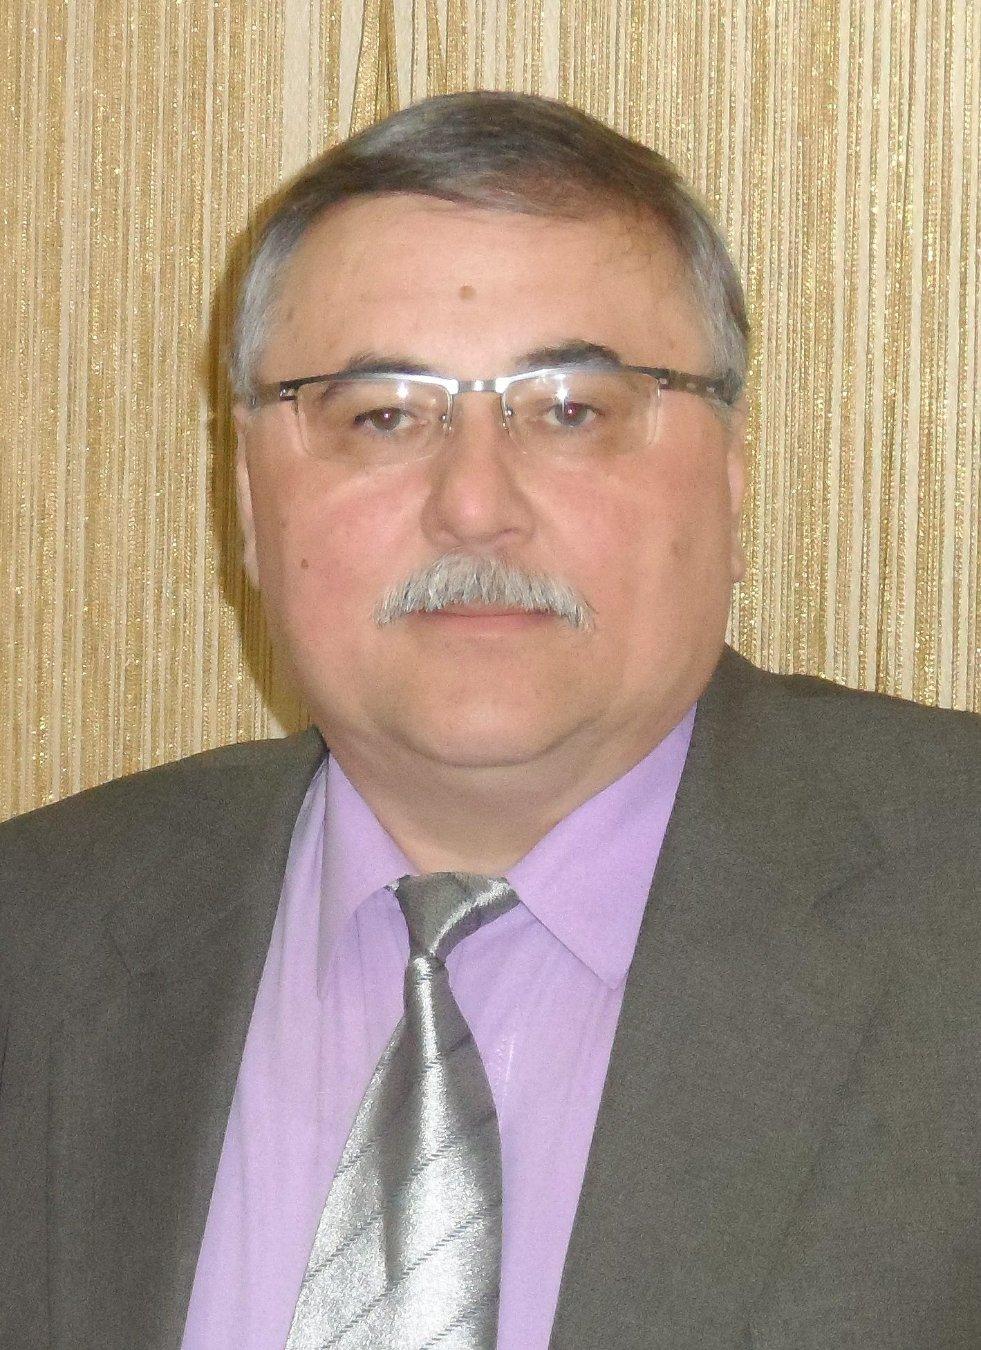 Мухаметгалиев Искандар Габдулвалиевич